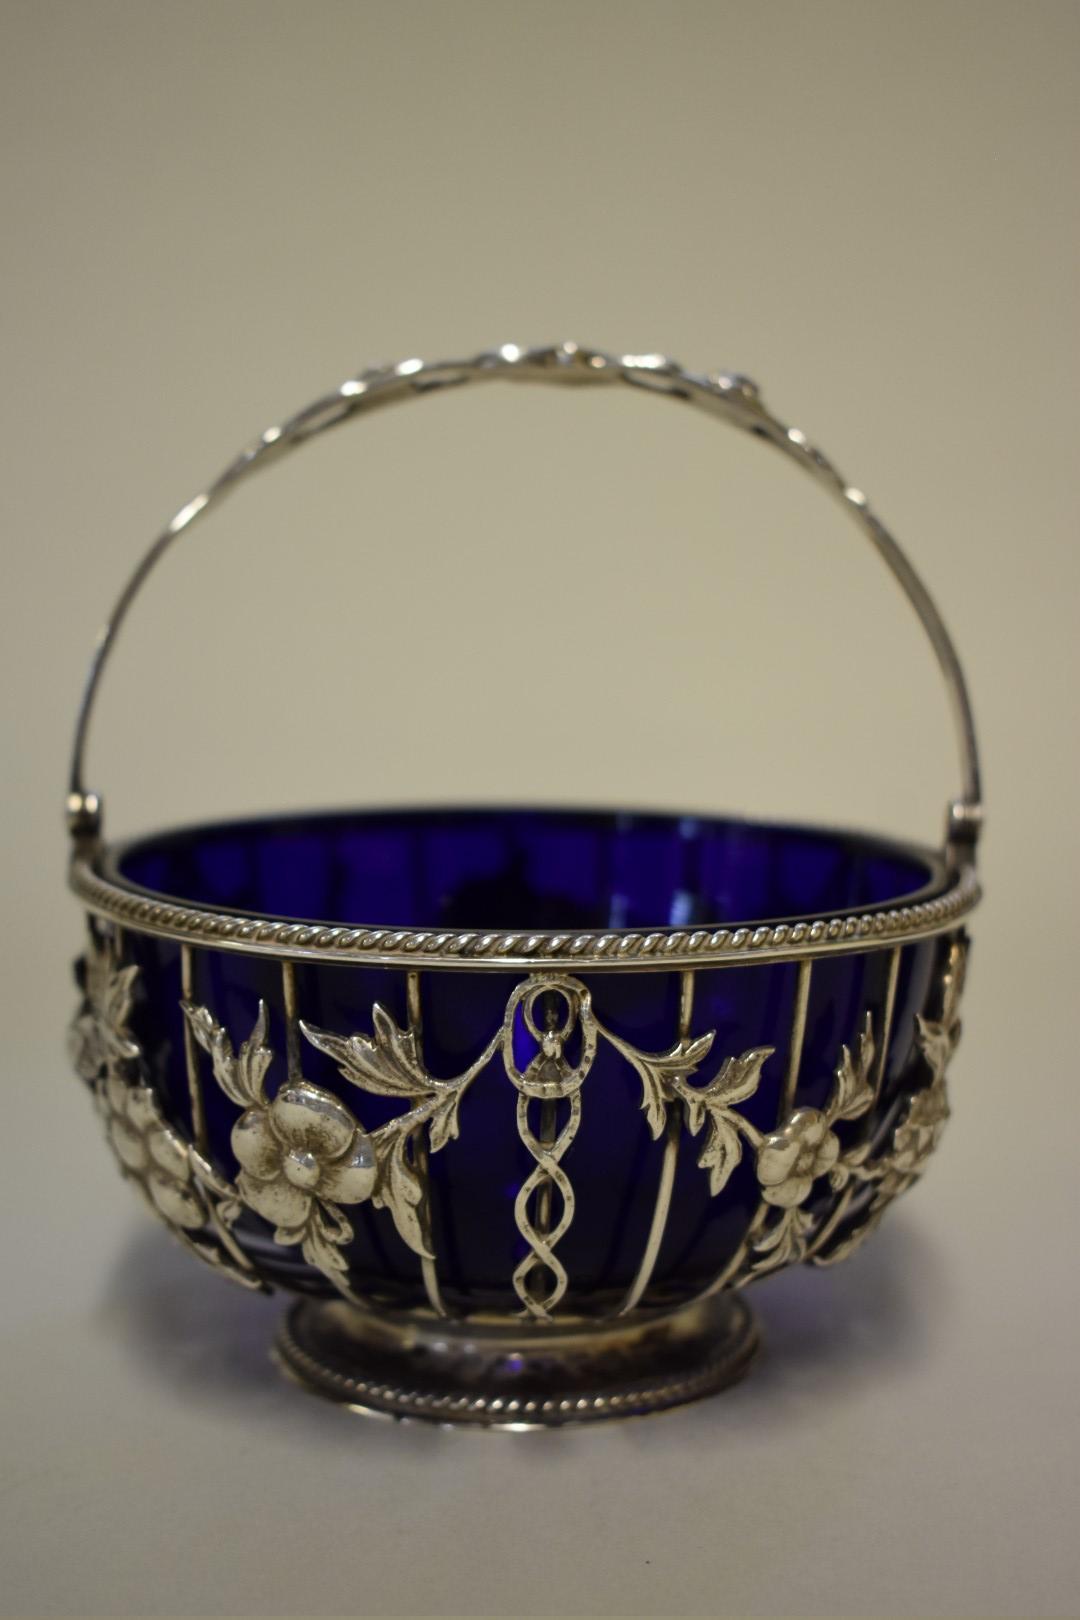 Lot 14 - A Victorian pierced silver basket,by Goldsmiths & Silversmiths Co,London 1896, having blue glass